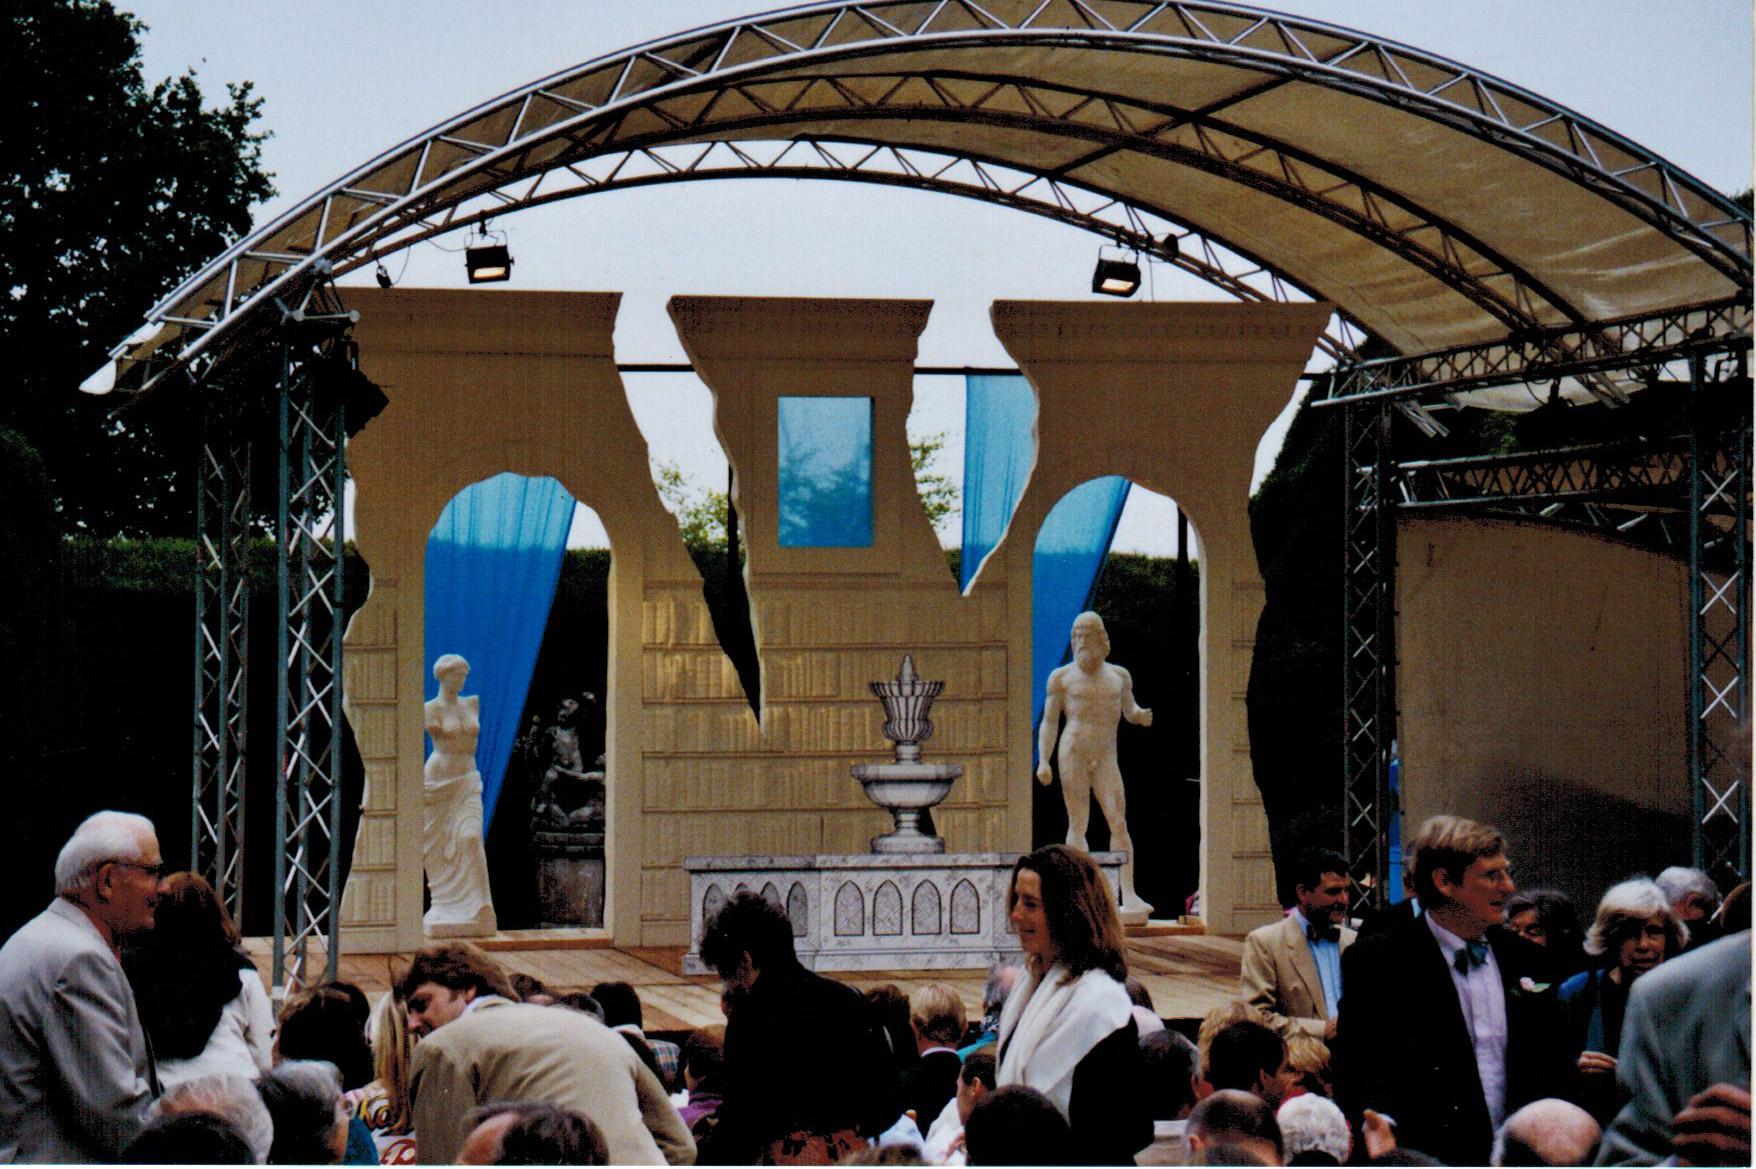 The-Barber-of-Seville,-Doddington-Place-Gardens,-2003